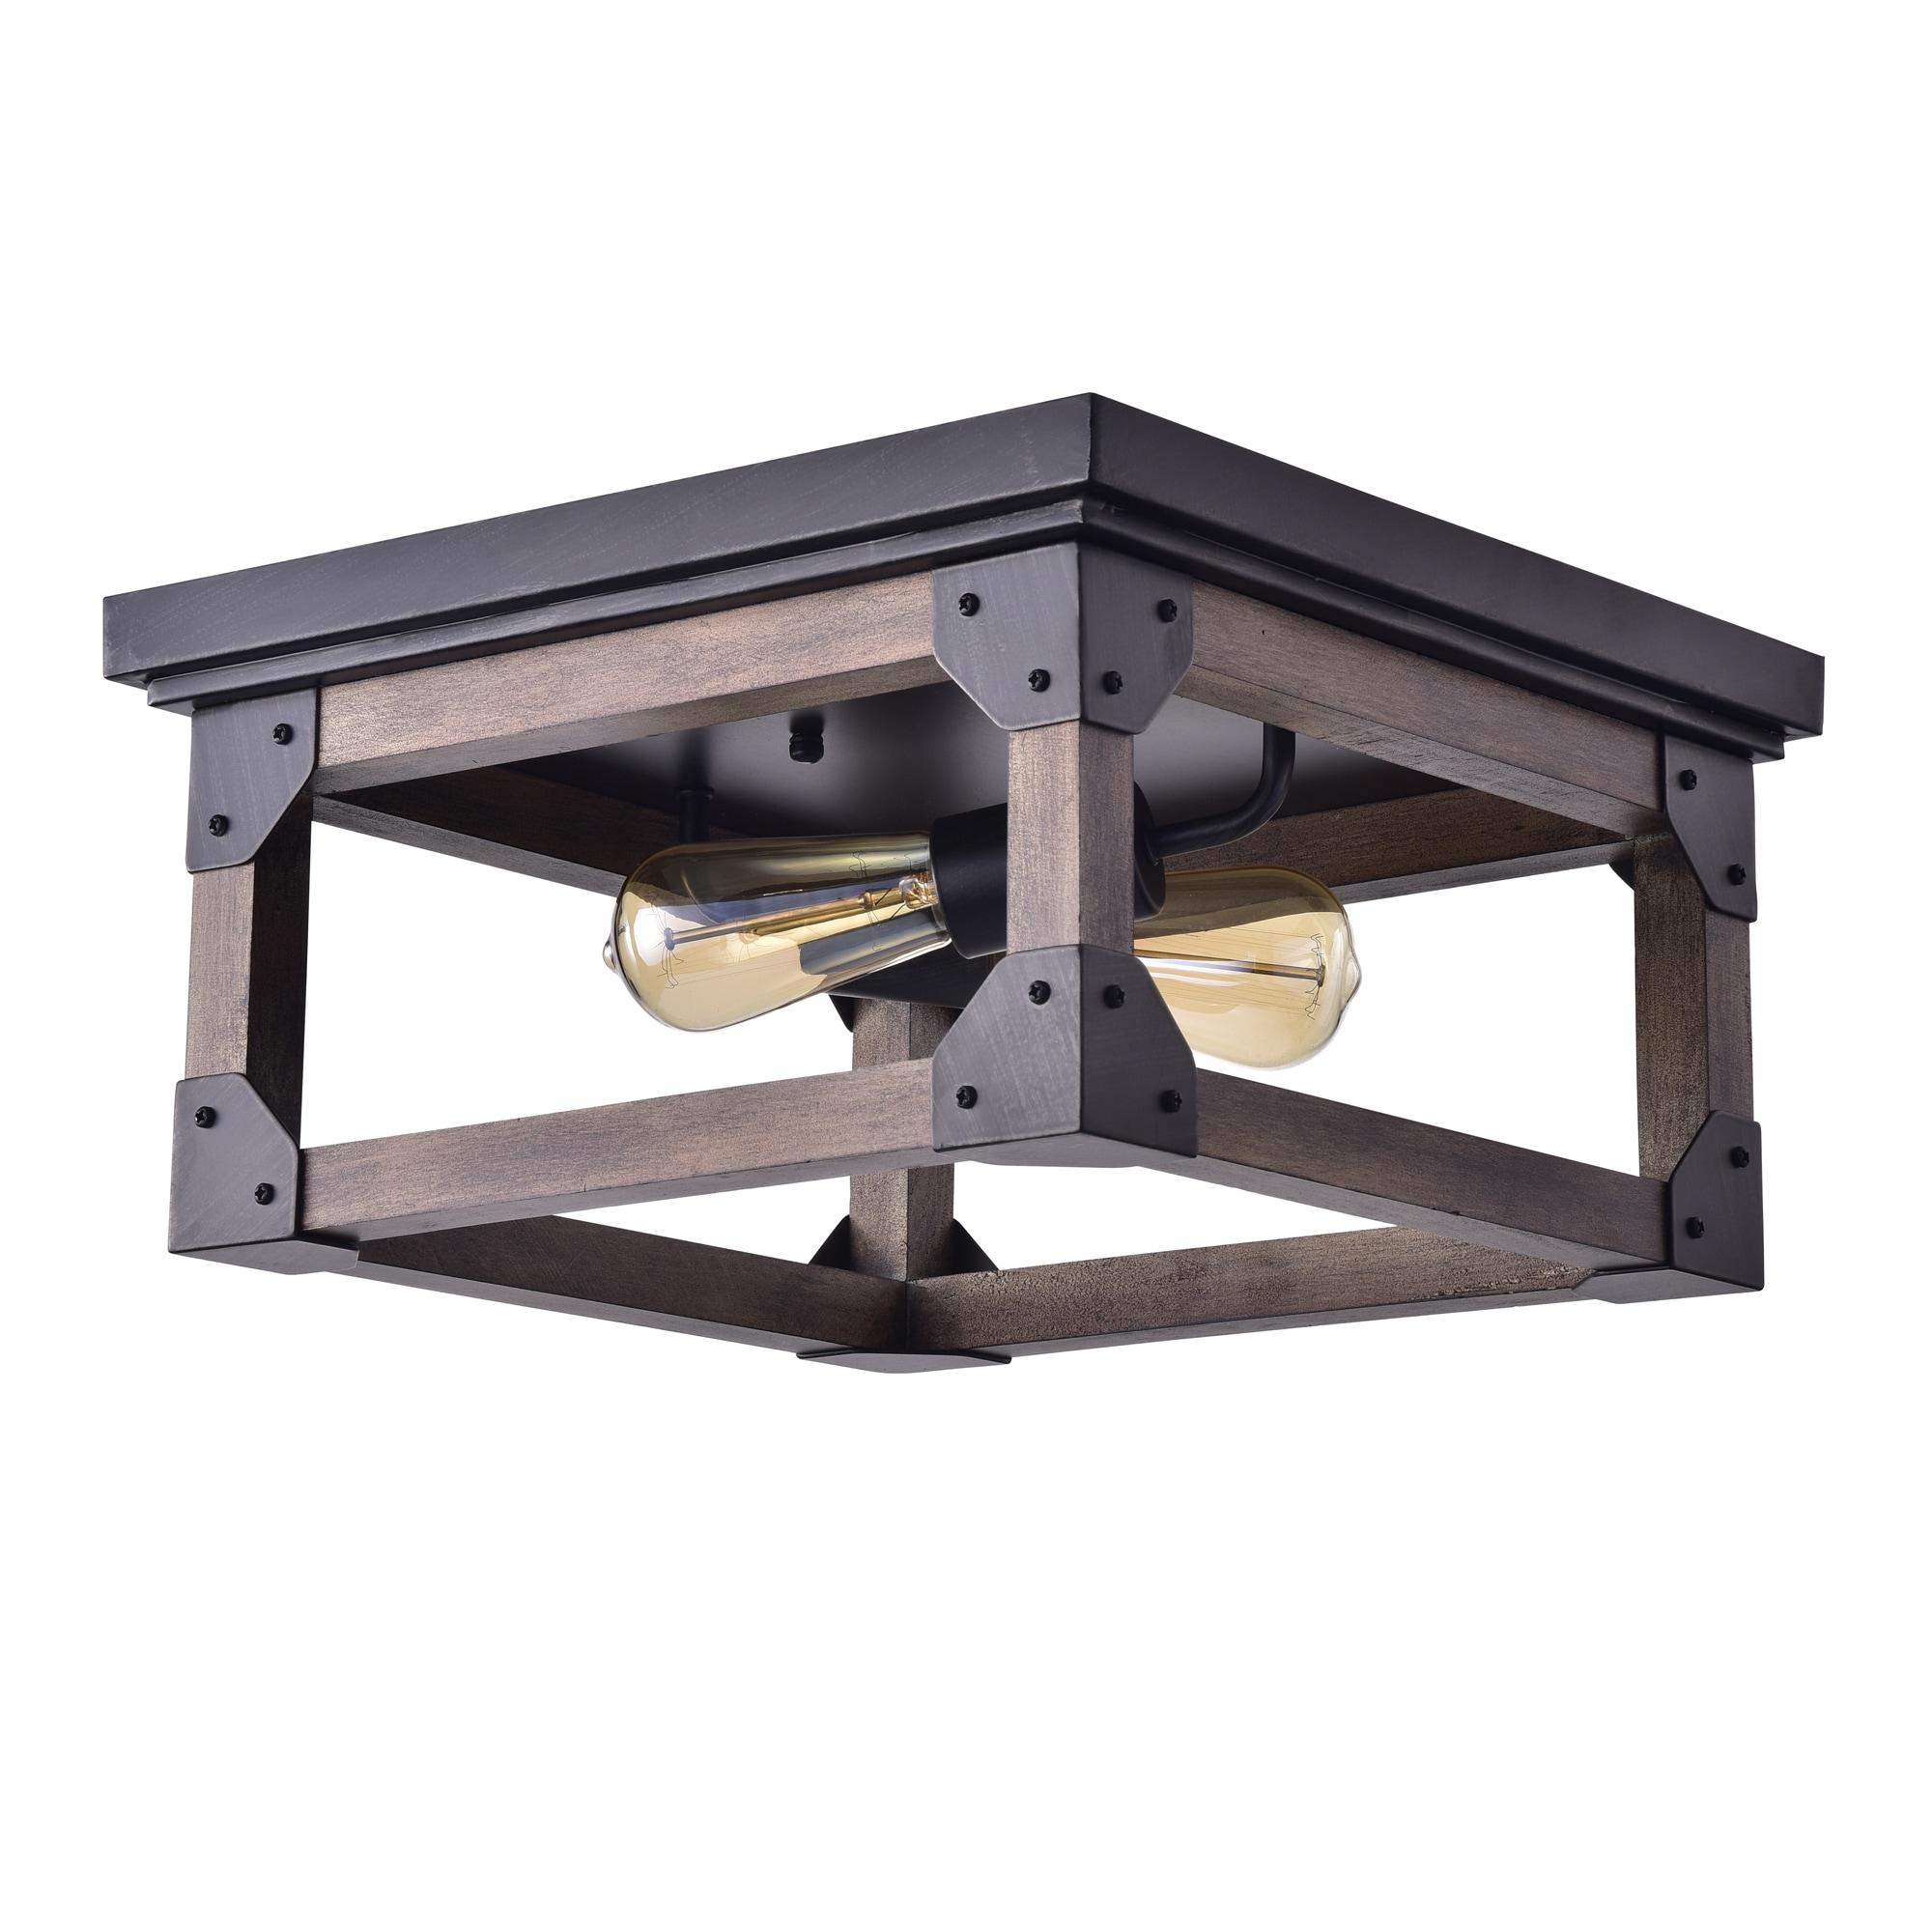 fixtures mount flush light lights for ceiling ideas lighting interesting ceilings home decorating decoration